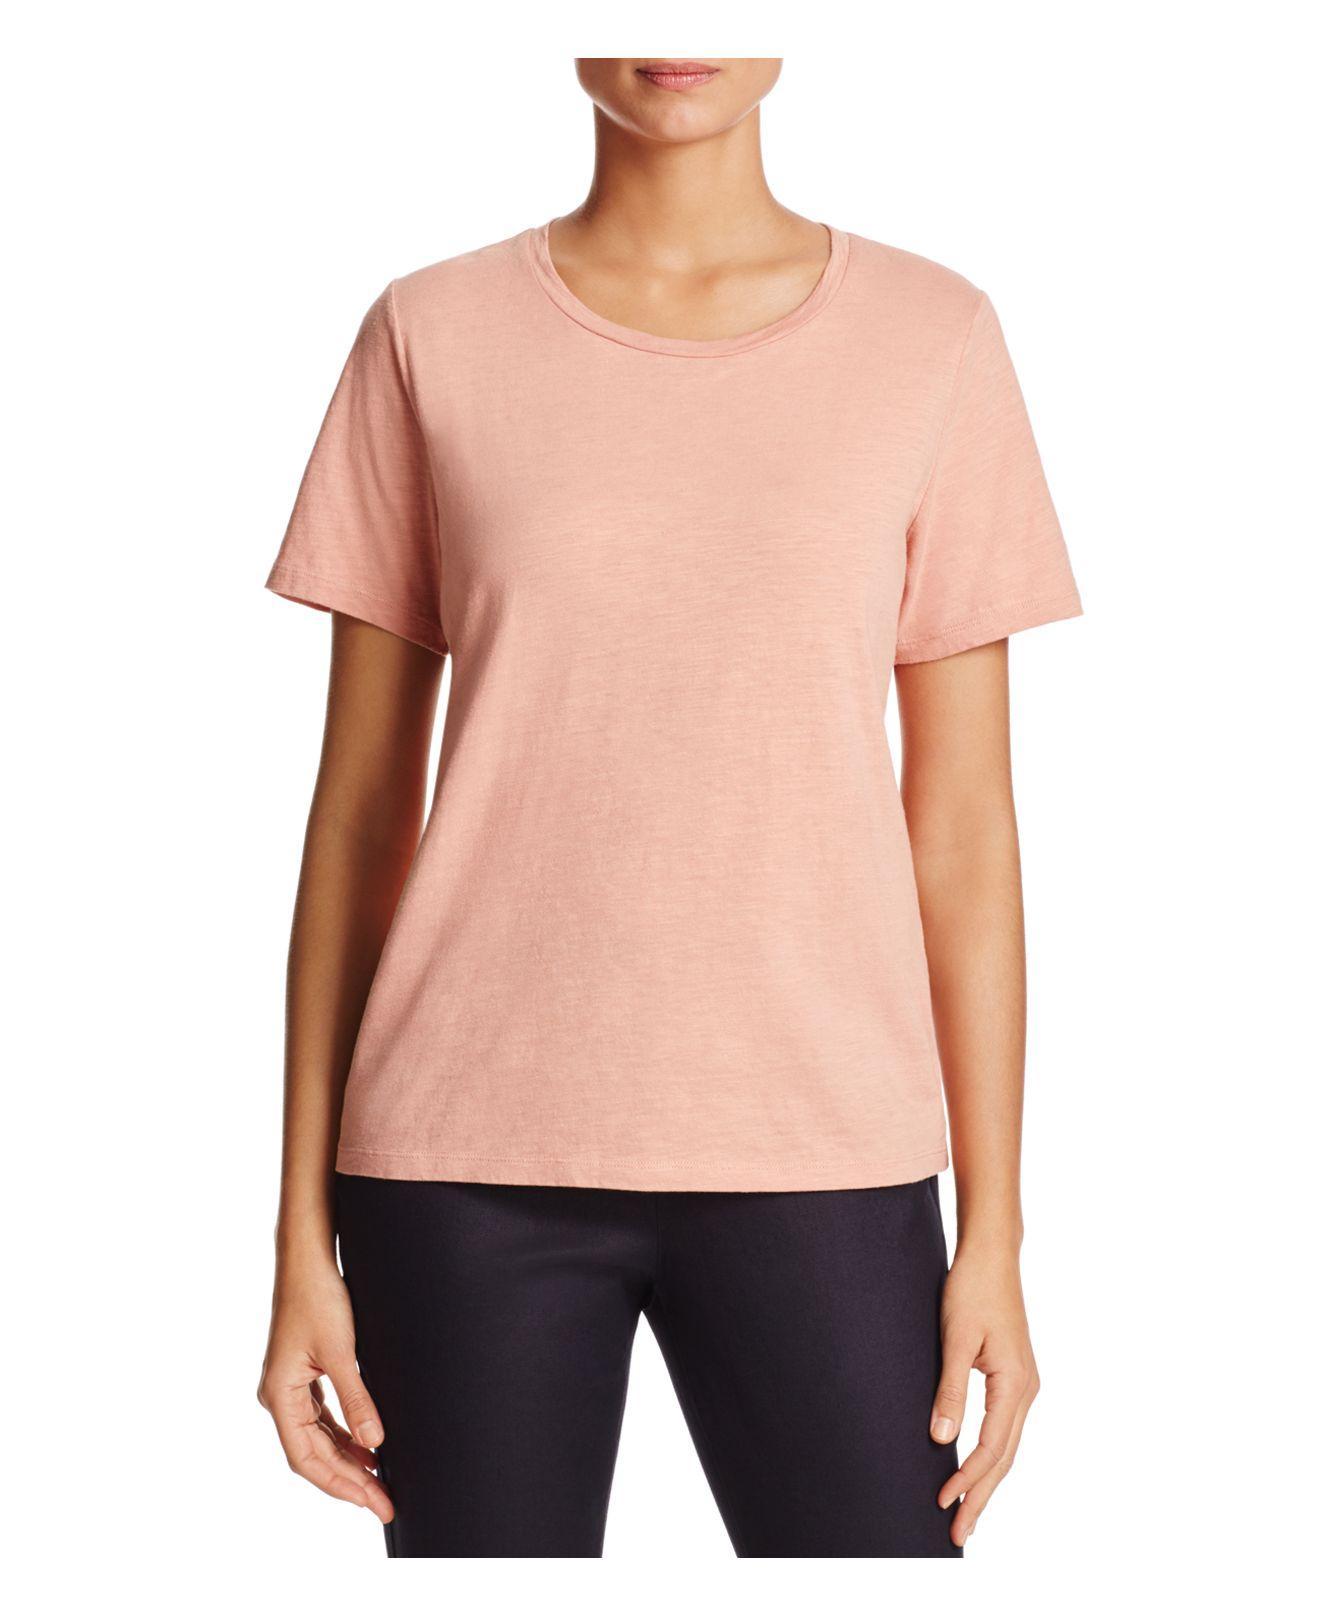 Lyst eileen fisher organic cotton heathered tee in pink for Eileen fisher organic cotton t shirt